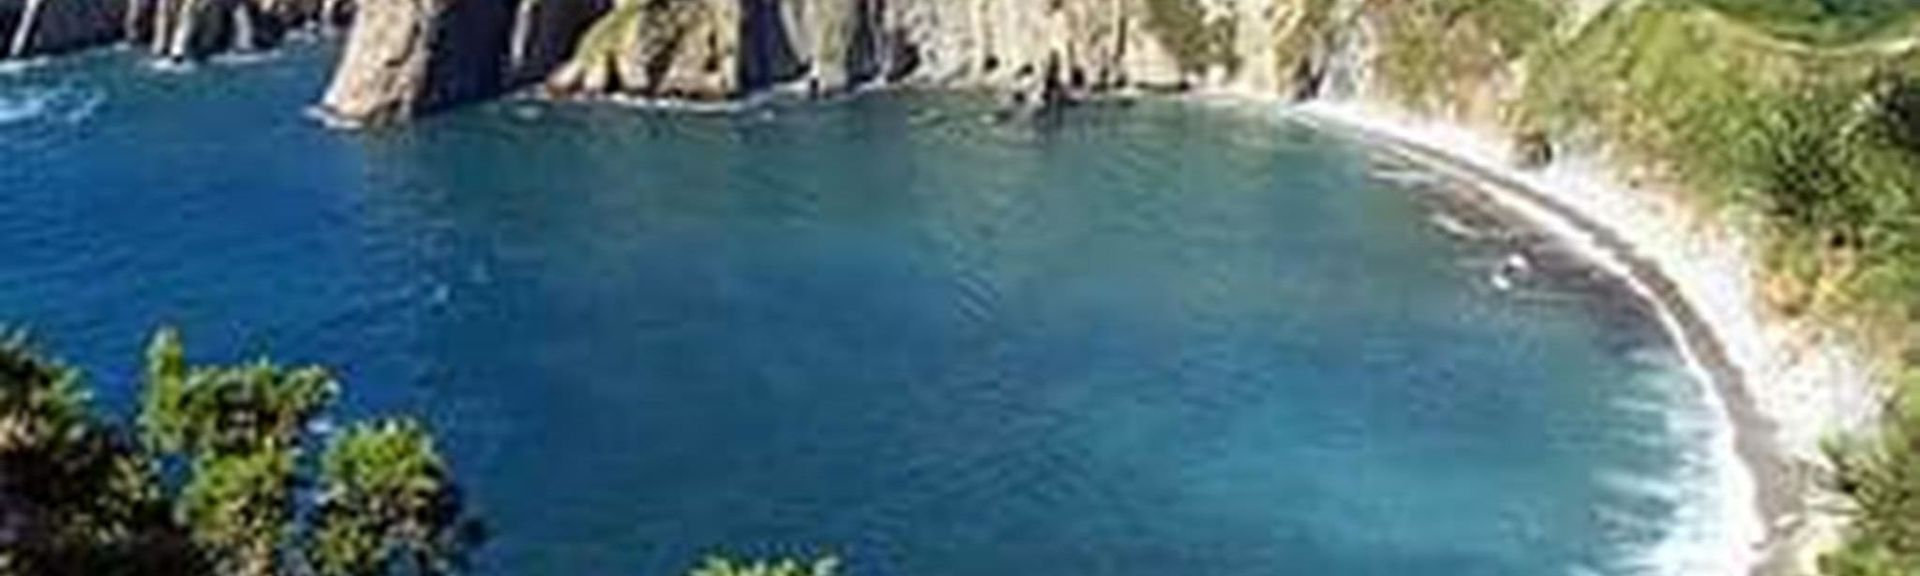 Playa de Torimbia, Niembro, Asturien, Spanien